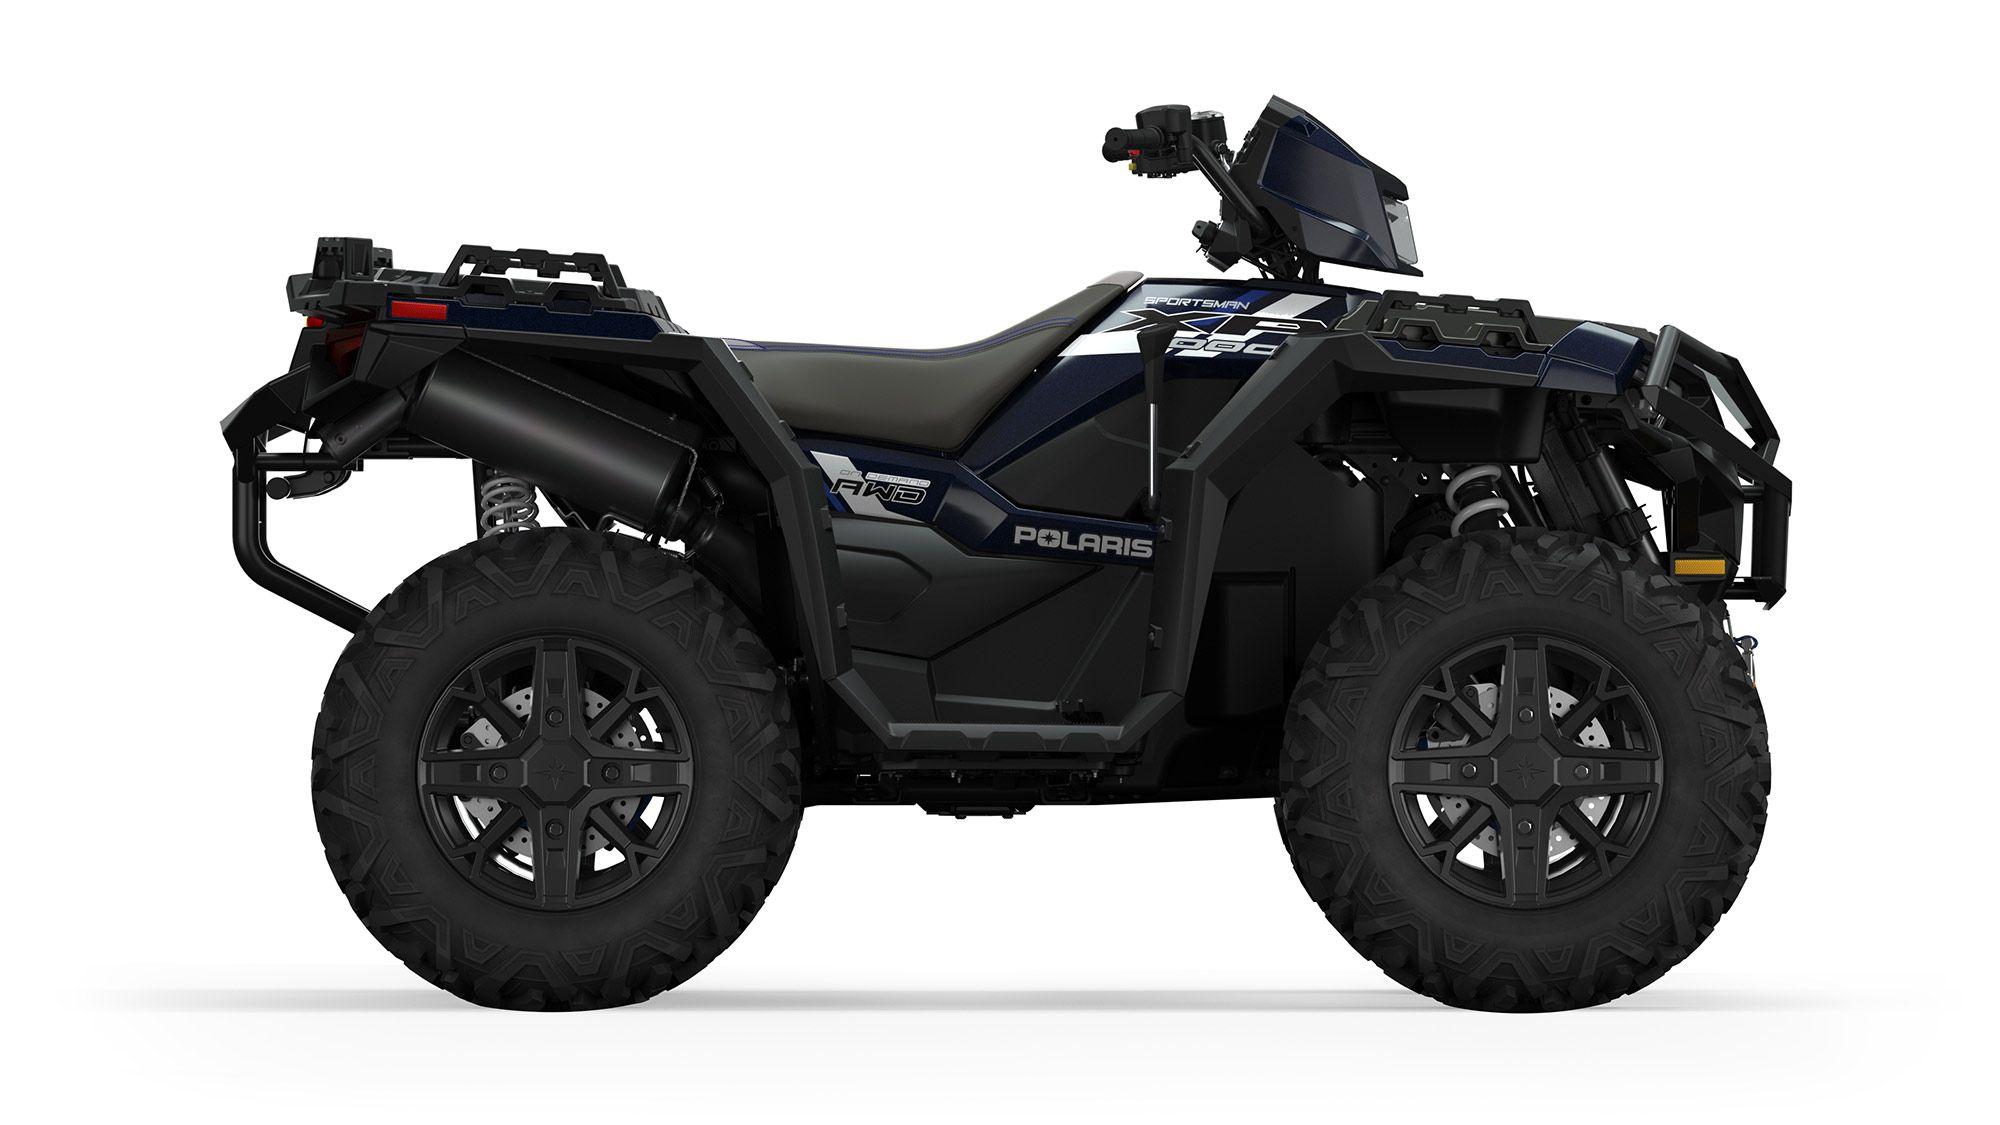 2022 Sportsman XP 1000 Ride Command Edition.